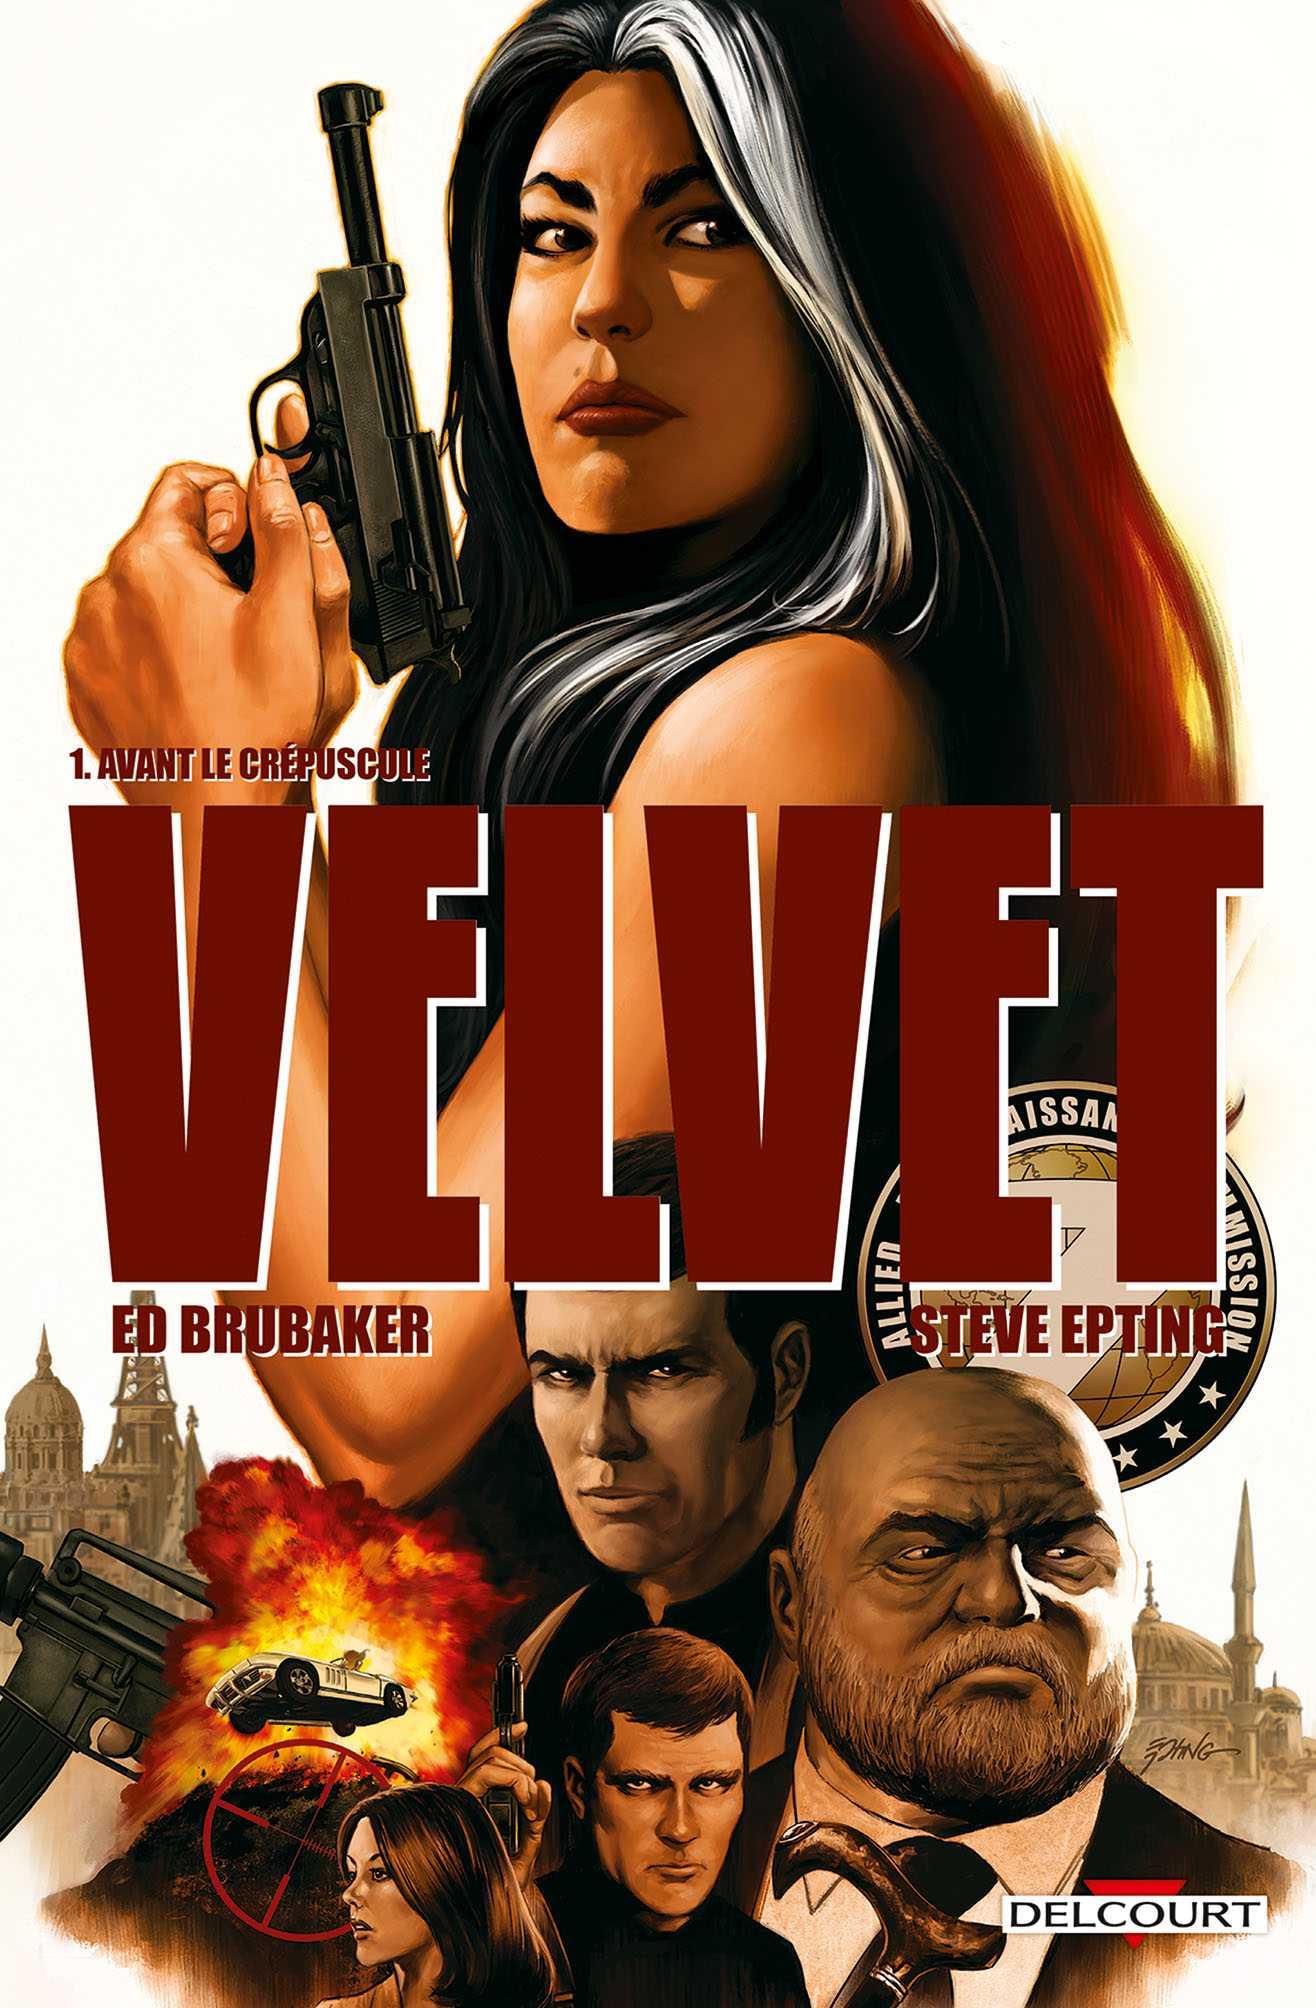 Velvet, une secrétaire très efficace par Ed Brubaker et Steve Epting